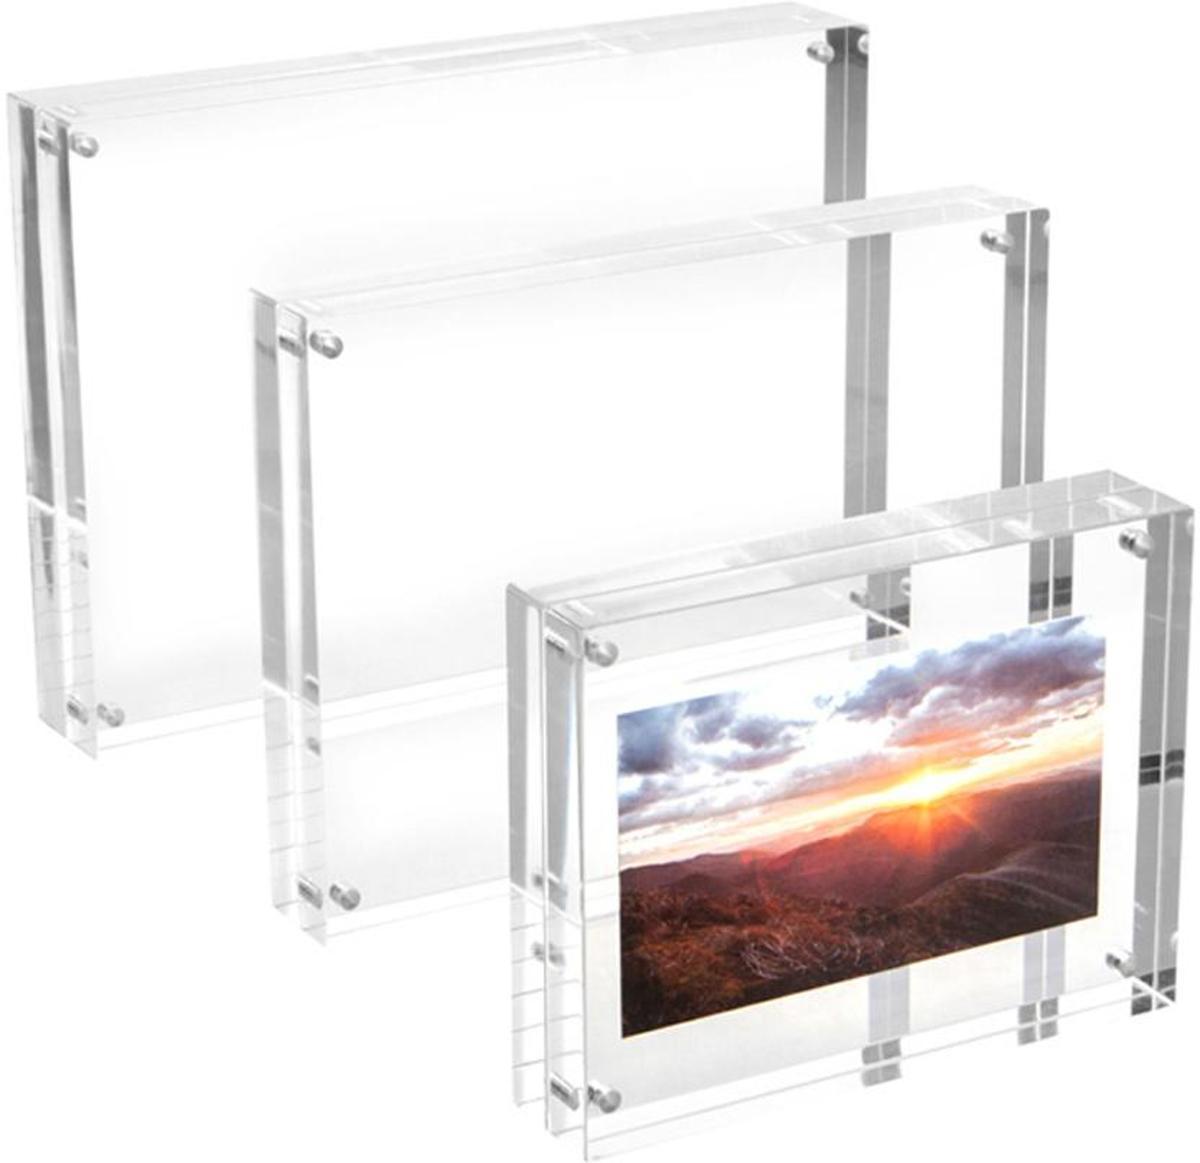 Maul acryl fotolijst ft 15 x 11,5 x 2,4 cm